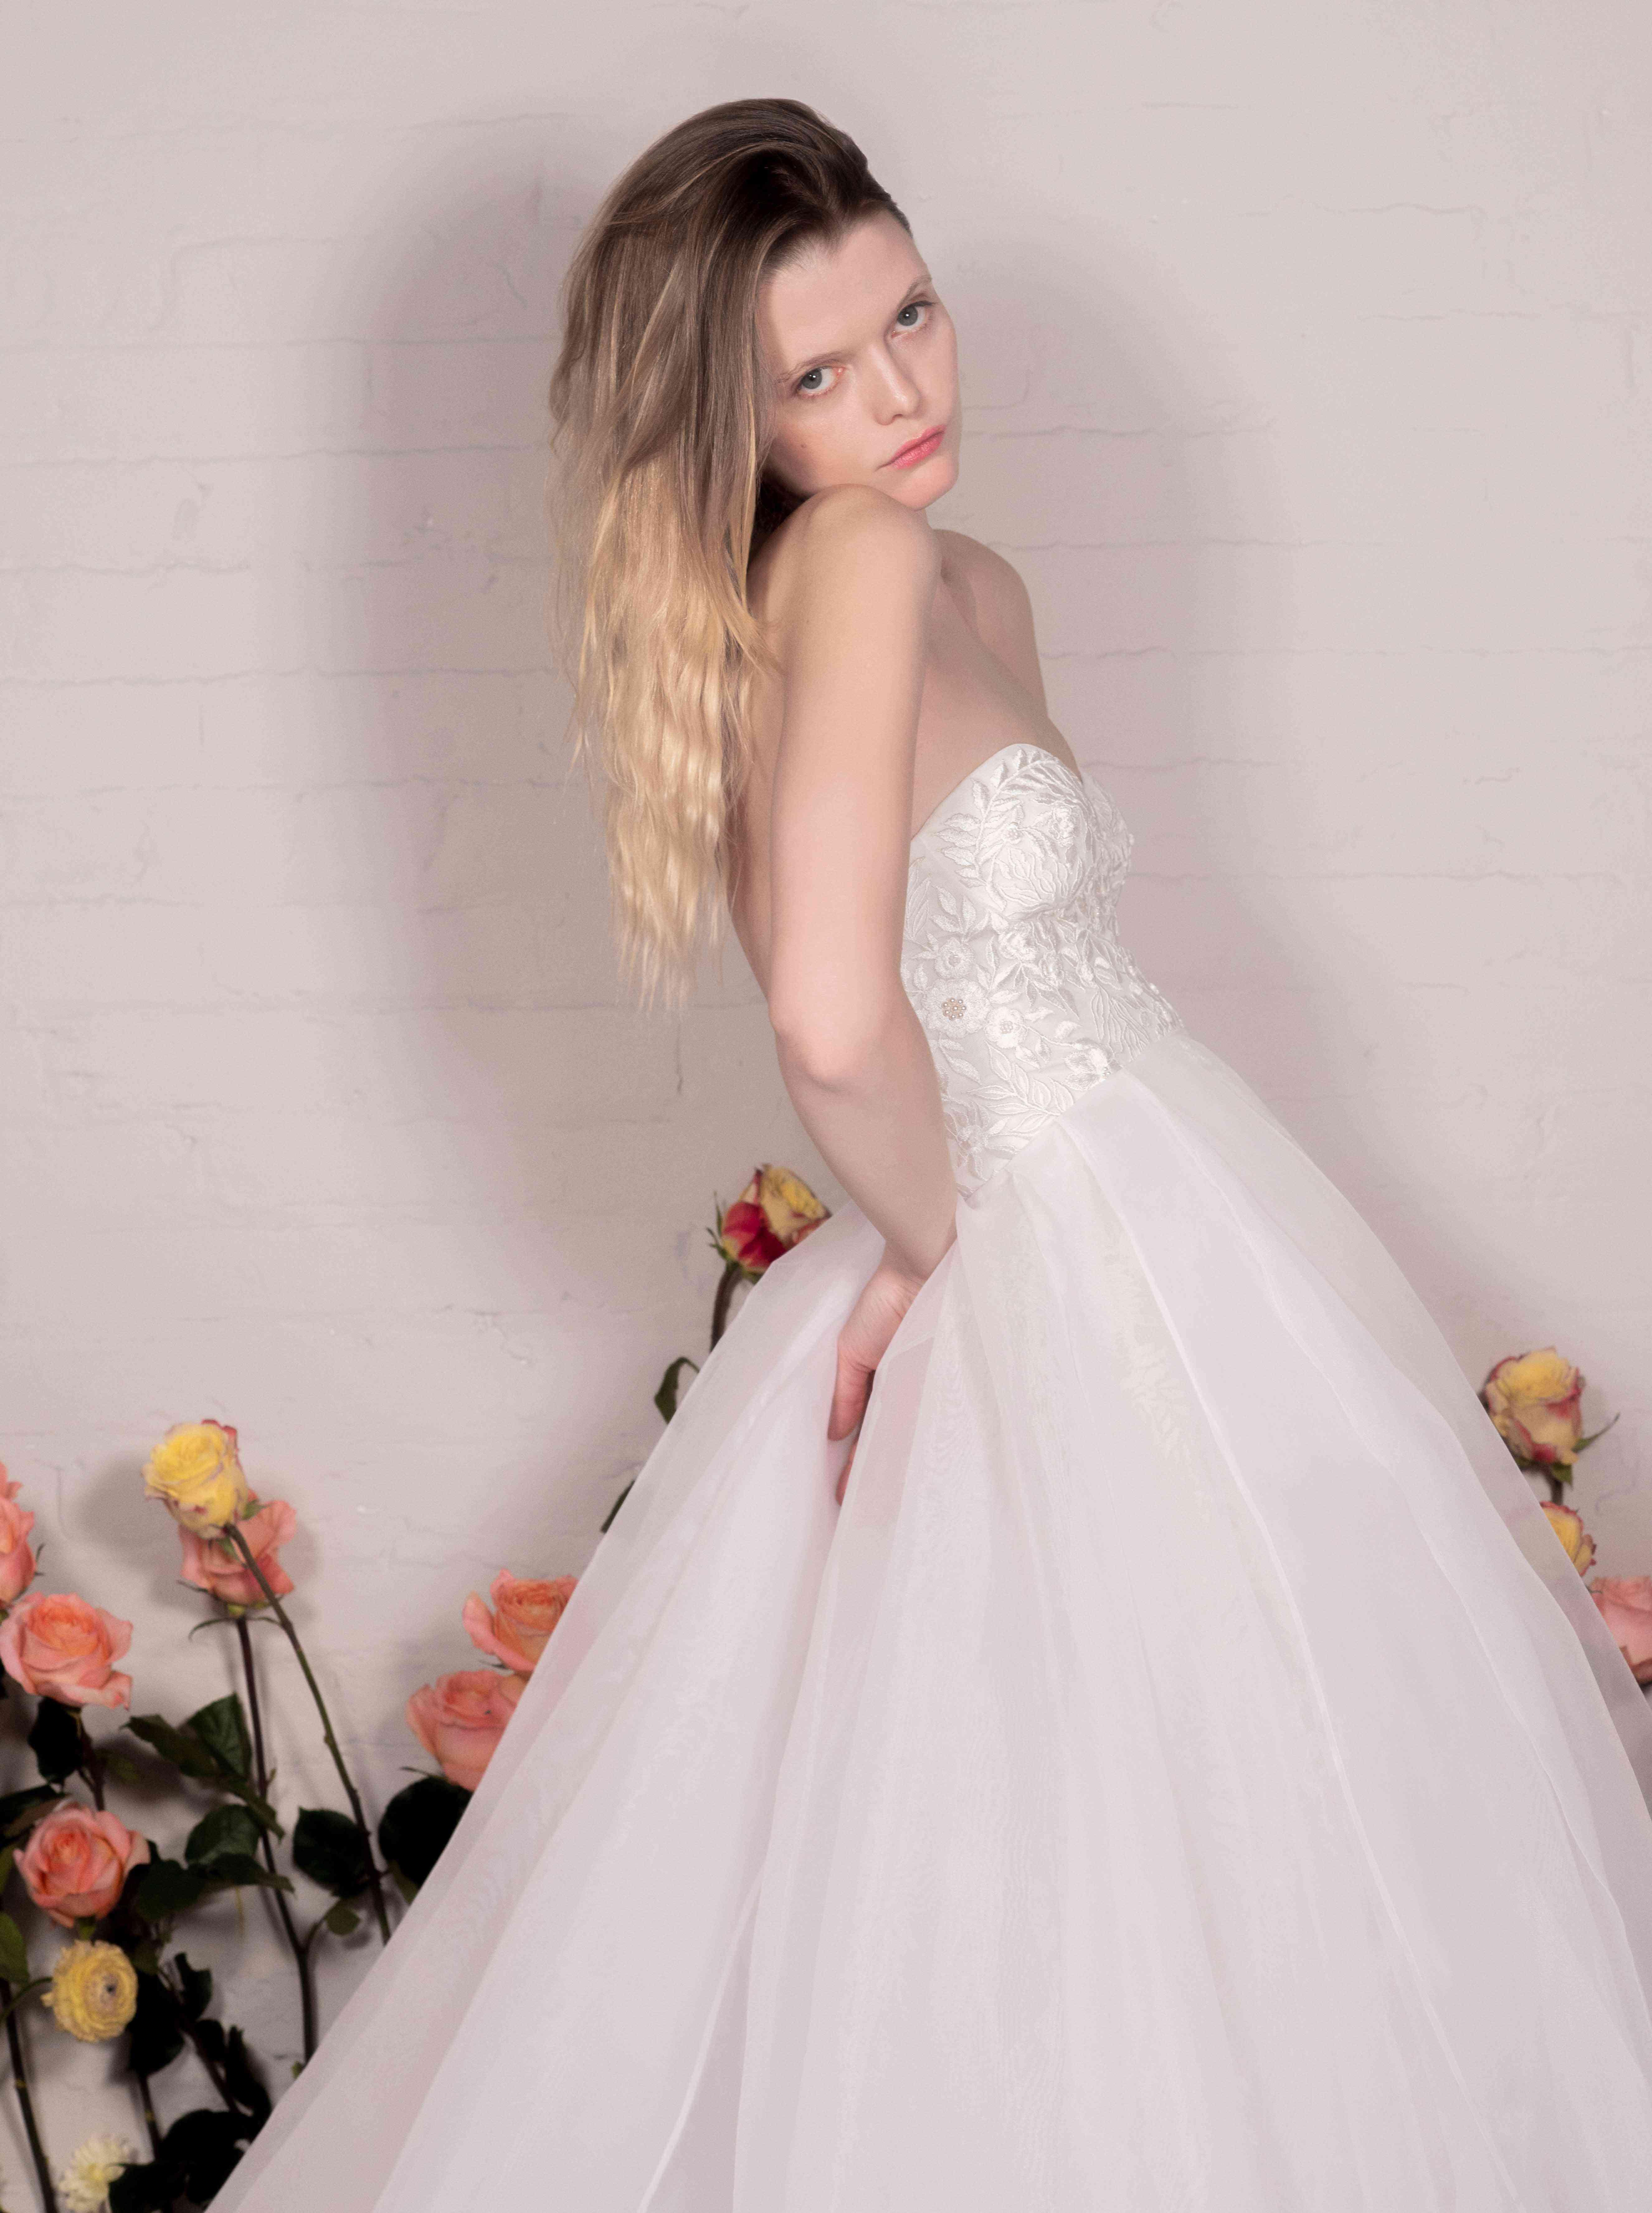 Wisteria bustier wedding dress and Organza Overskirt